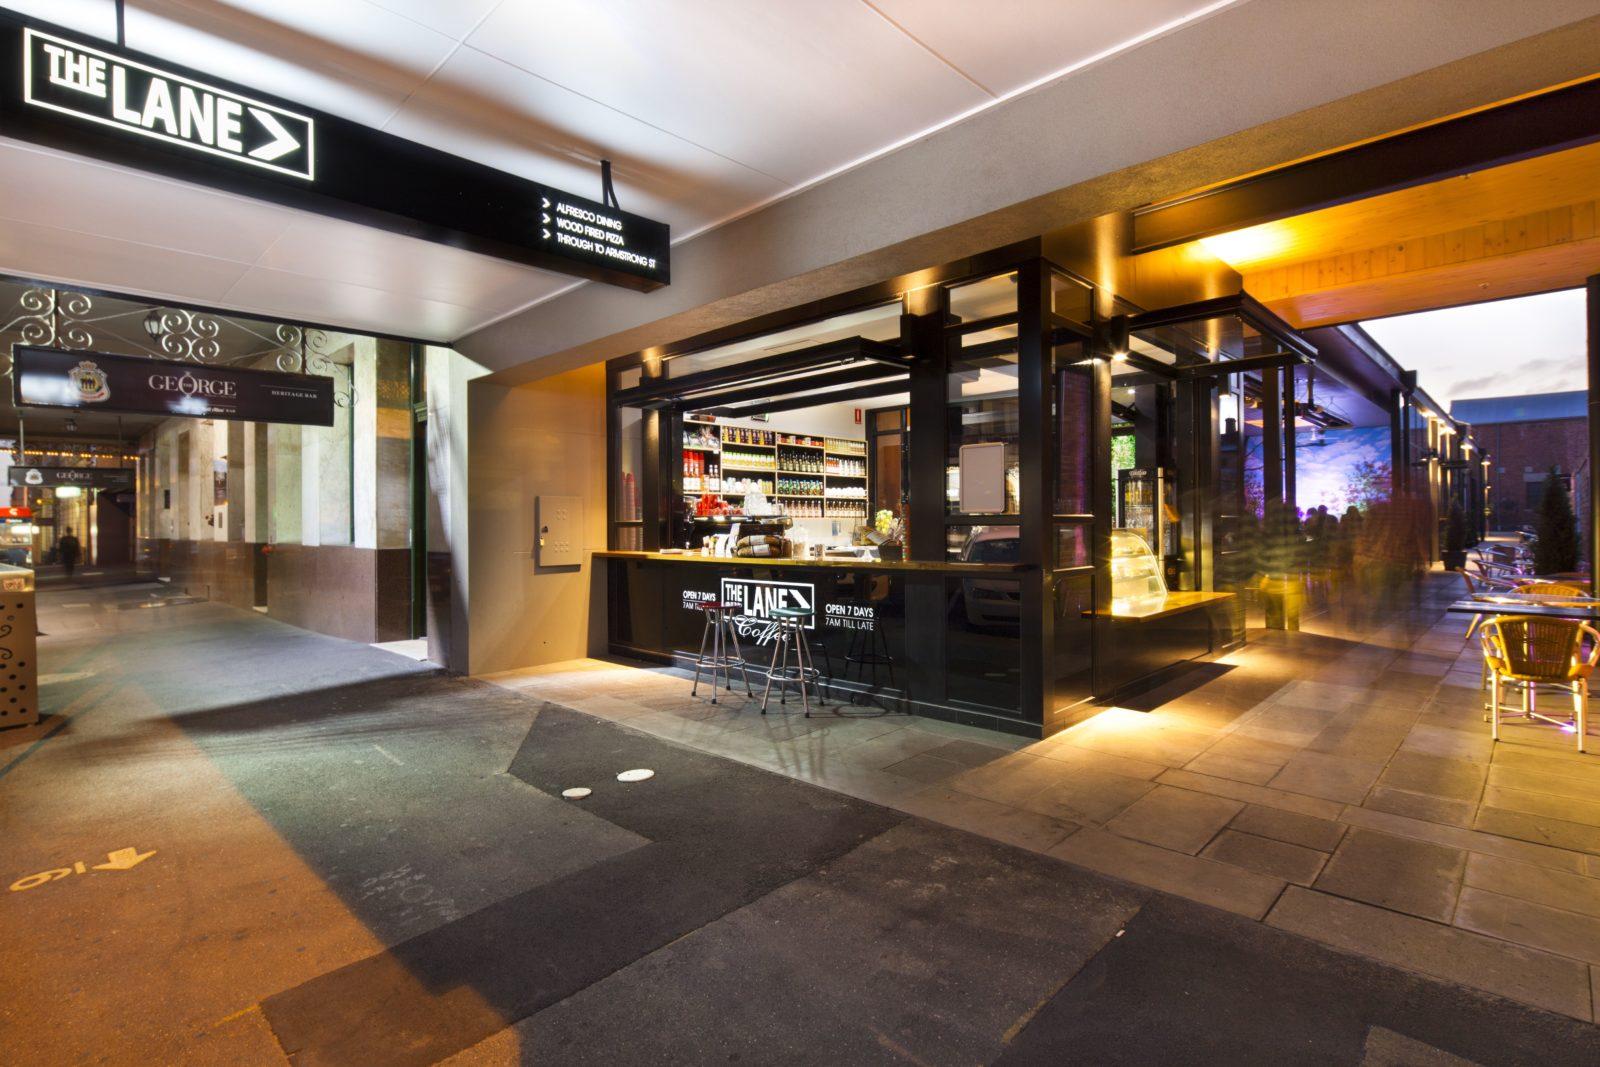 The Lane at The George Hotel Ballarat